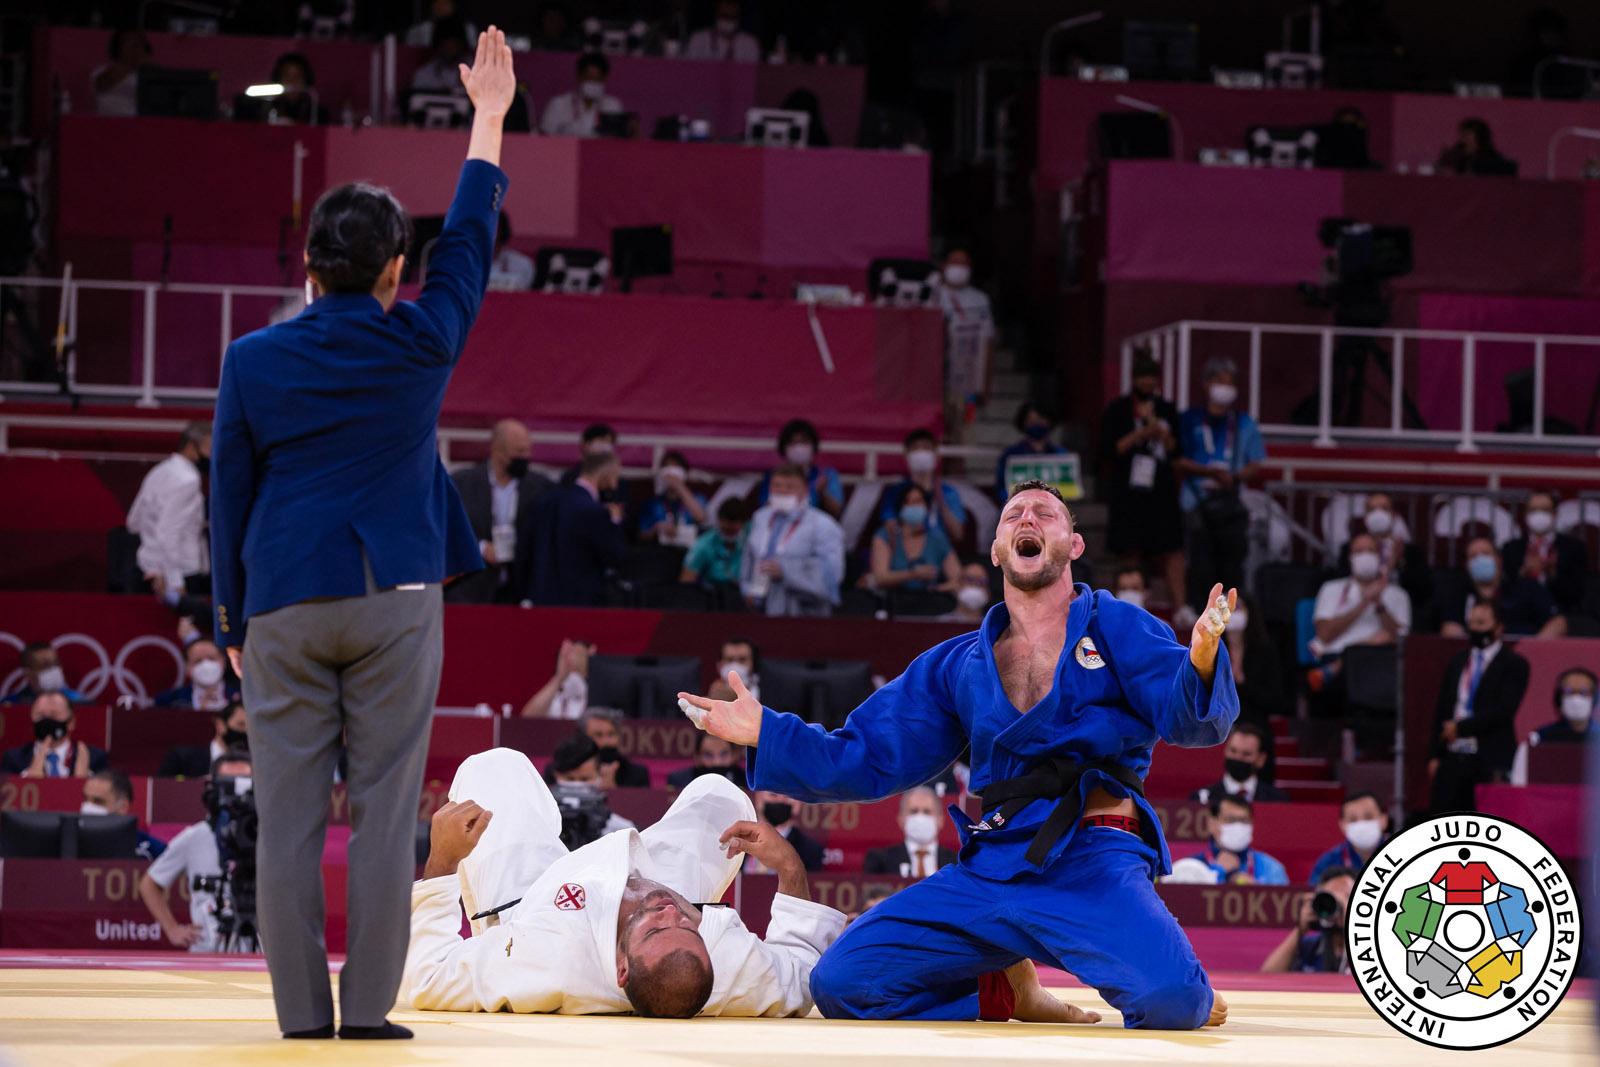 2021-olympijske-hry-tokio-judo-krpalek-web-1